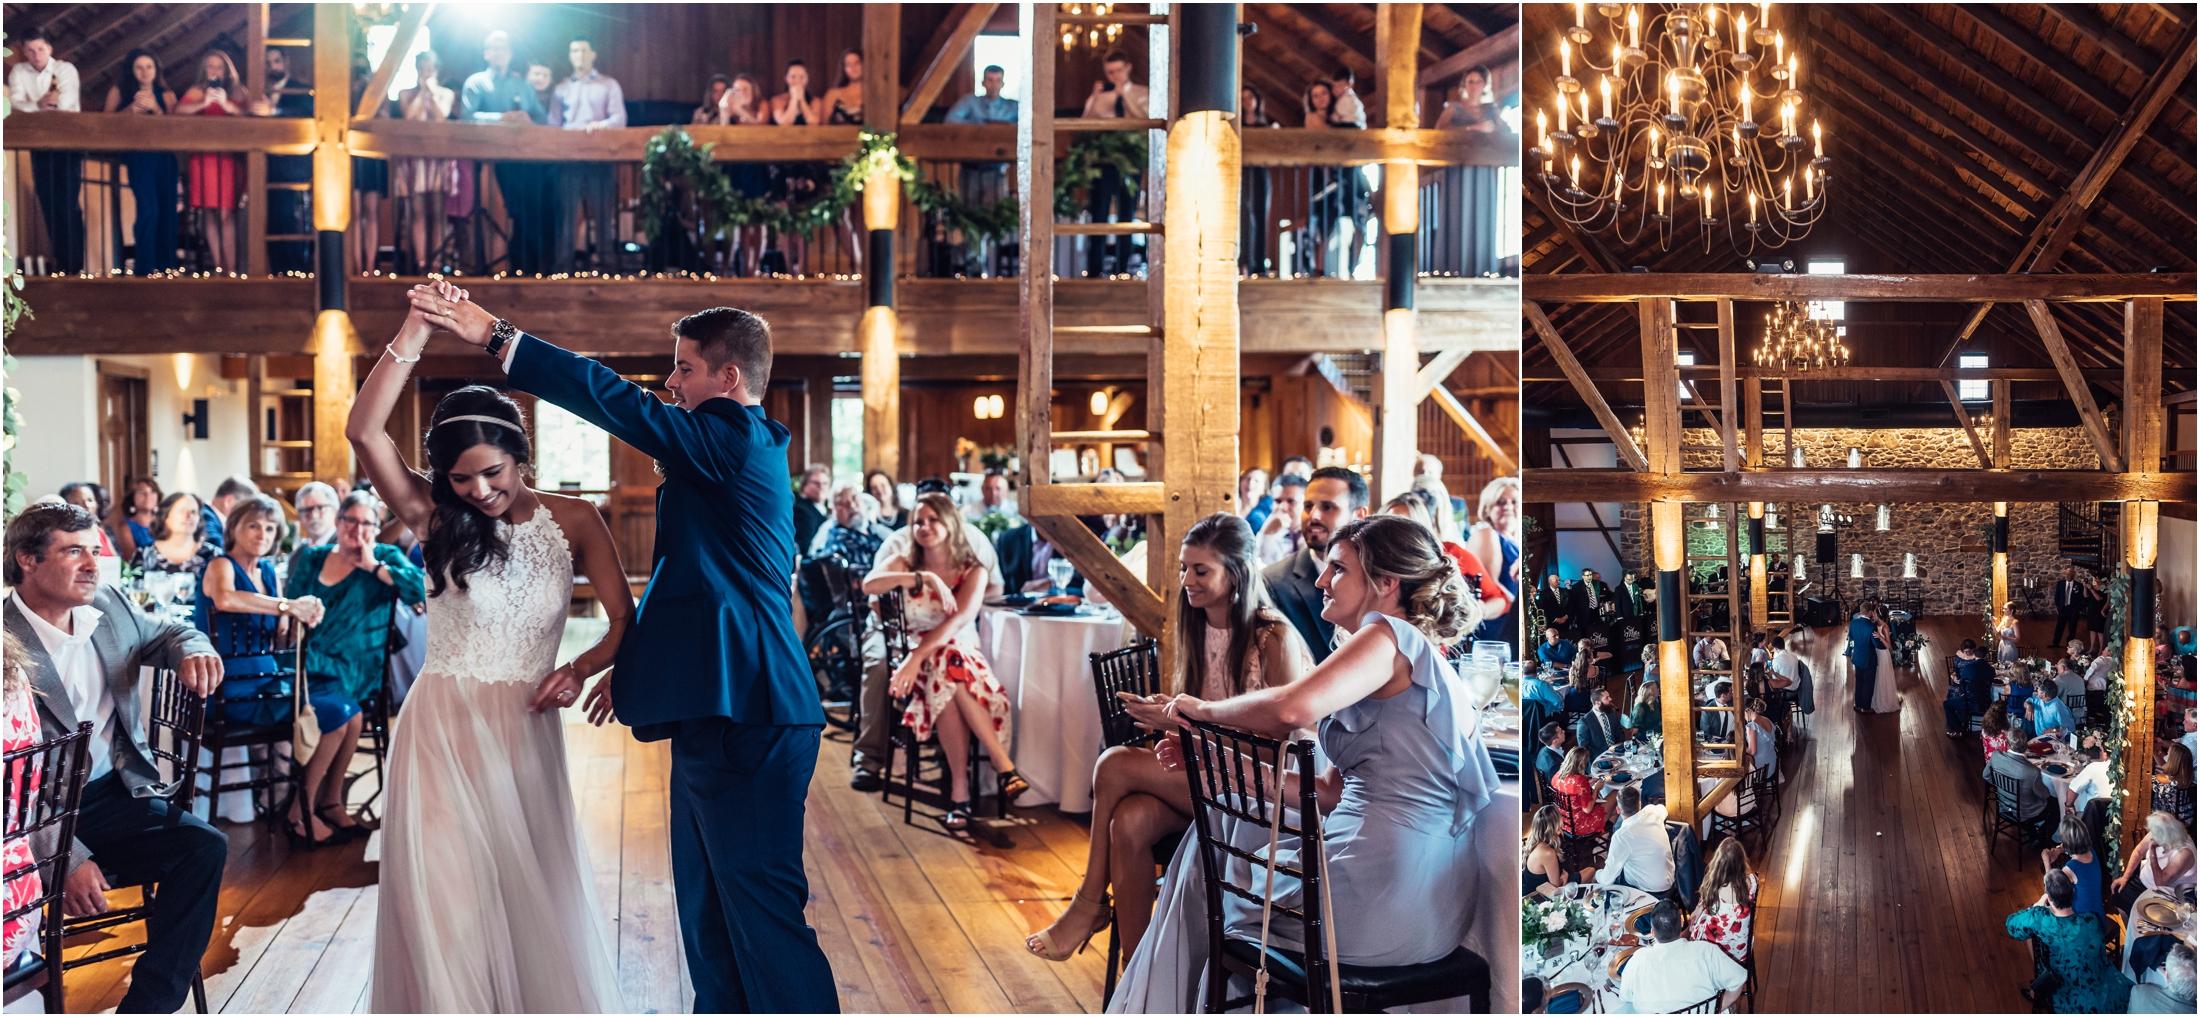 Steph&Bryan_Lancaster_wedding_farm_0539.jpg